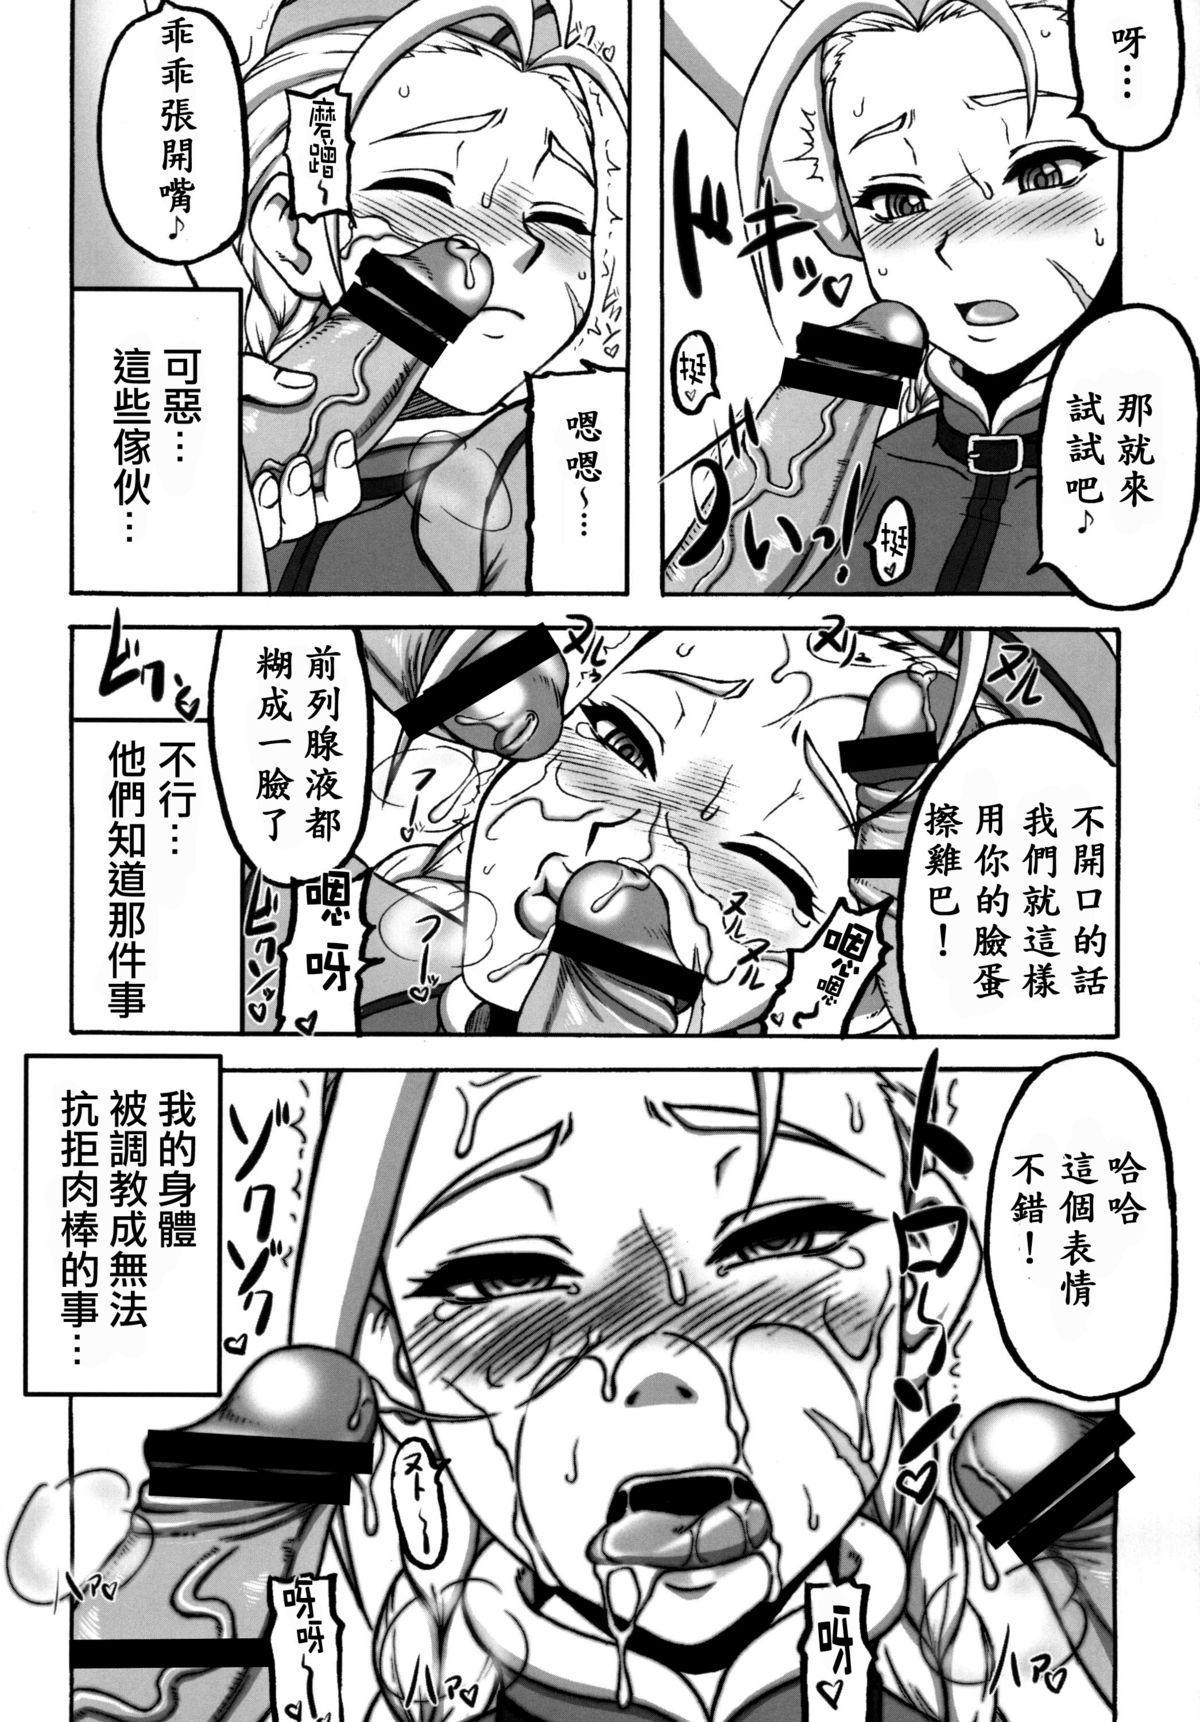 Kakutou Musume Houimou 3 3